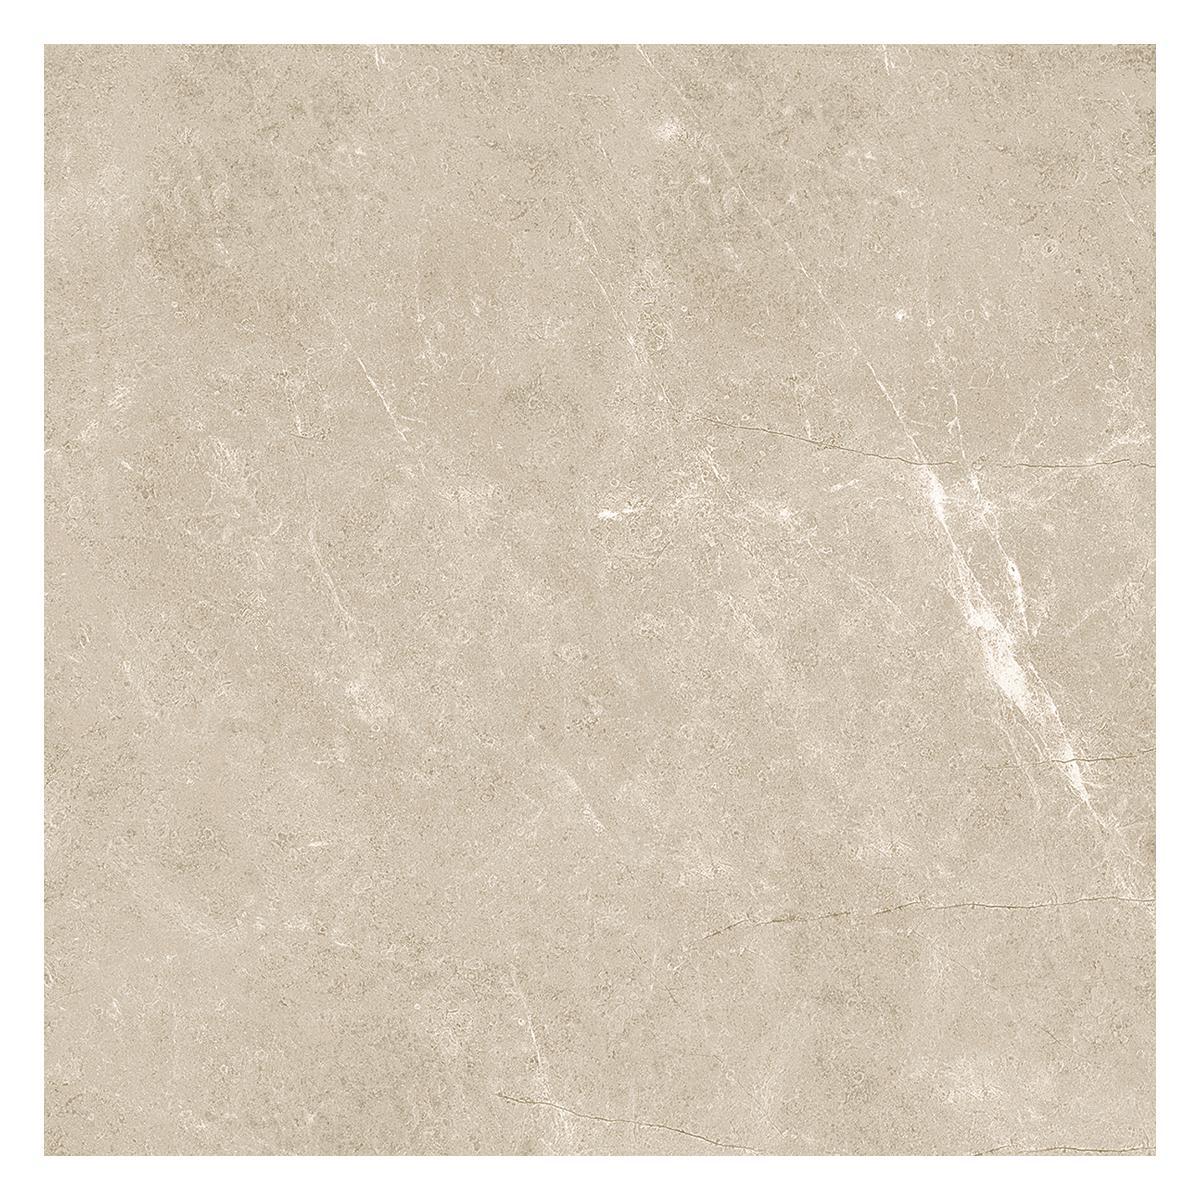 Gres Porcelánico Artic Beige Mate - 61X61 cm - 1.48 m2